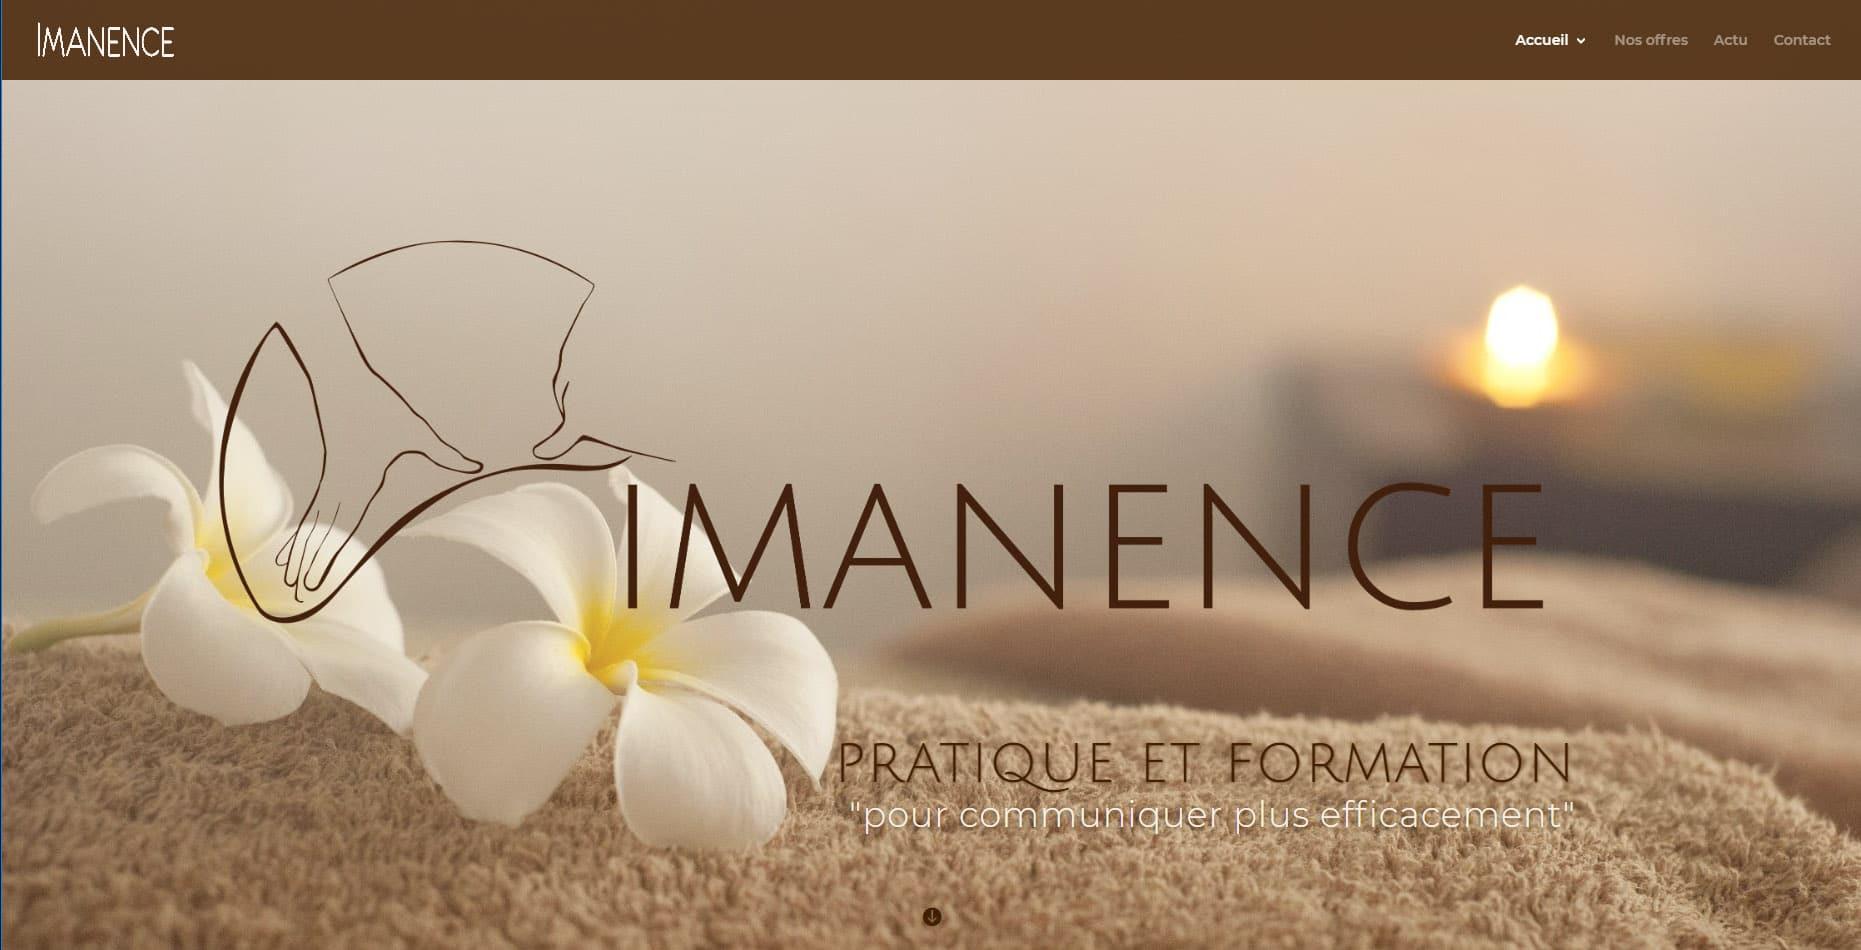 imanence_06